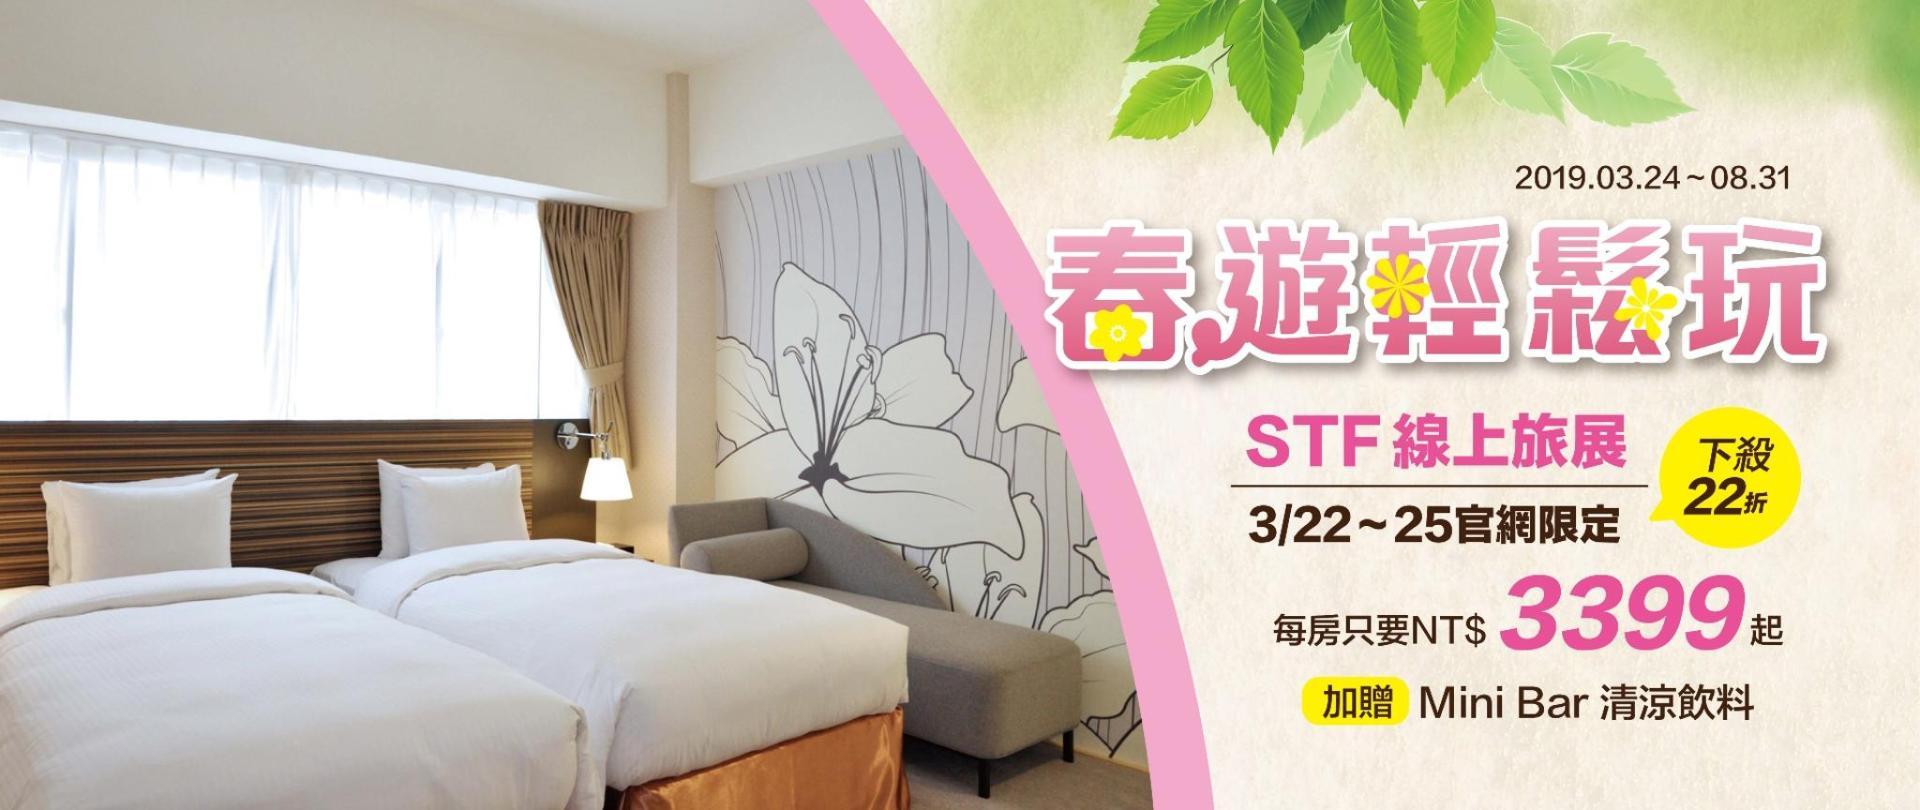 Slide Show1920X810_2019STF春遊輕鬆玩.jpg